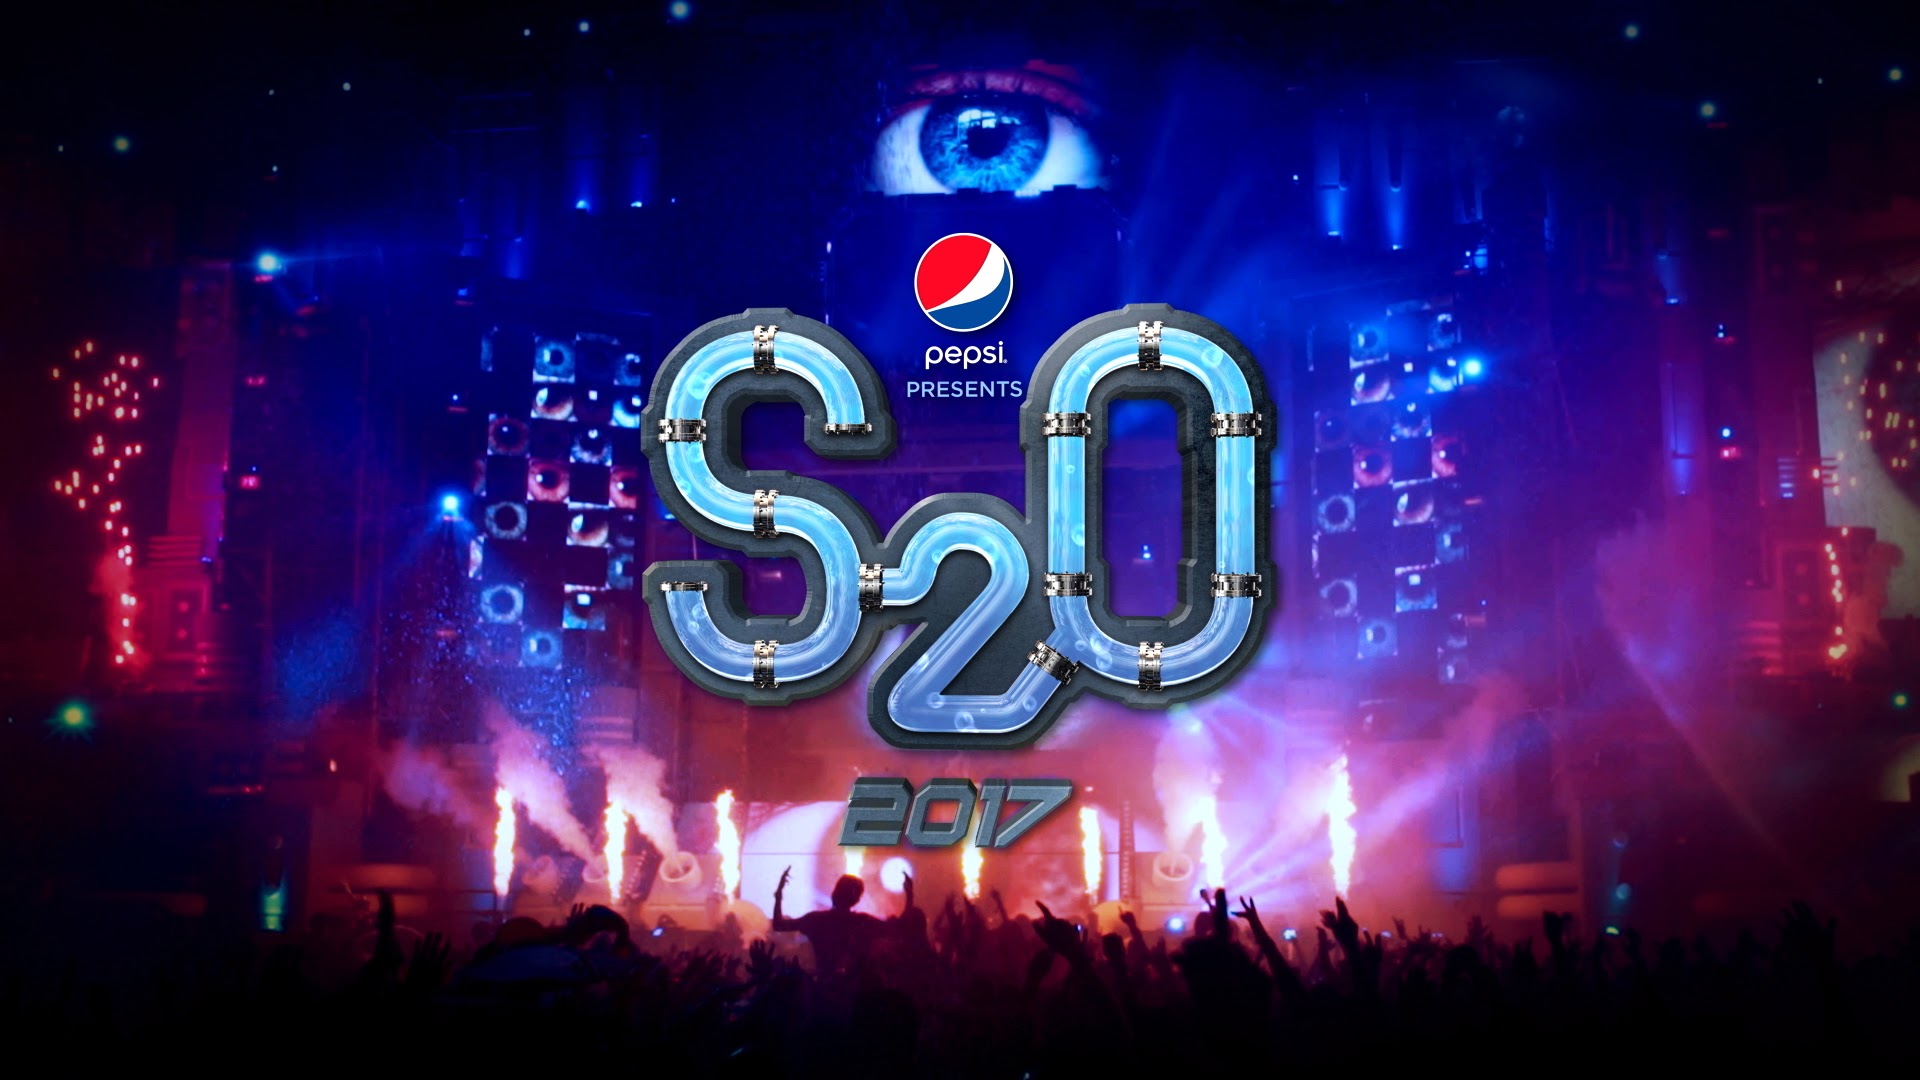 S2O BANGKOK / 2017 / Festival Aftermovie